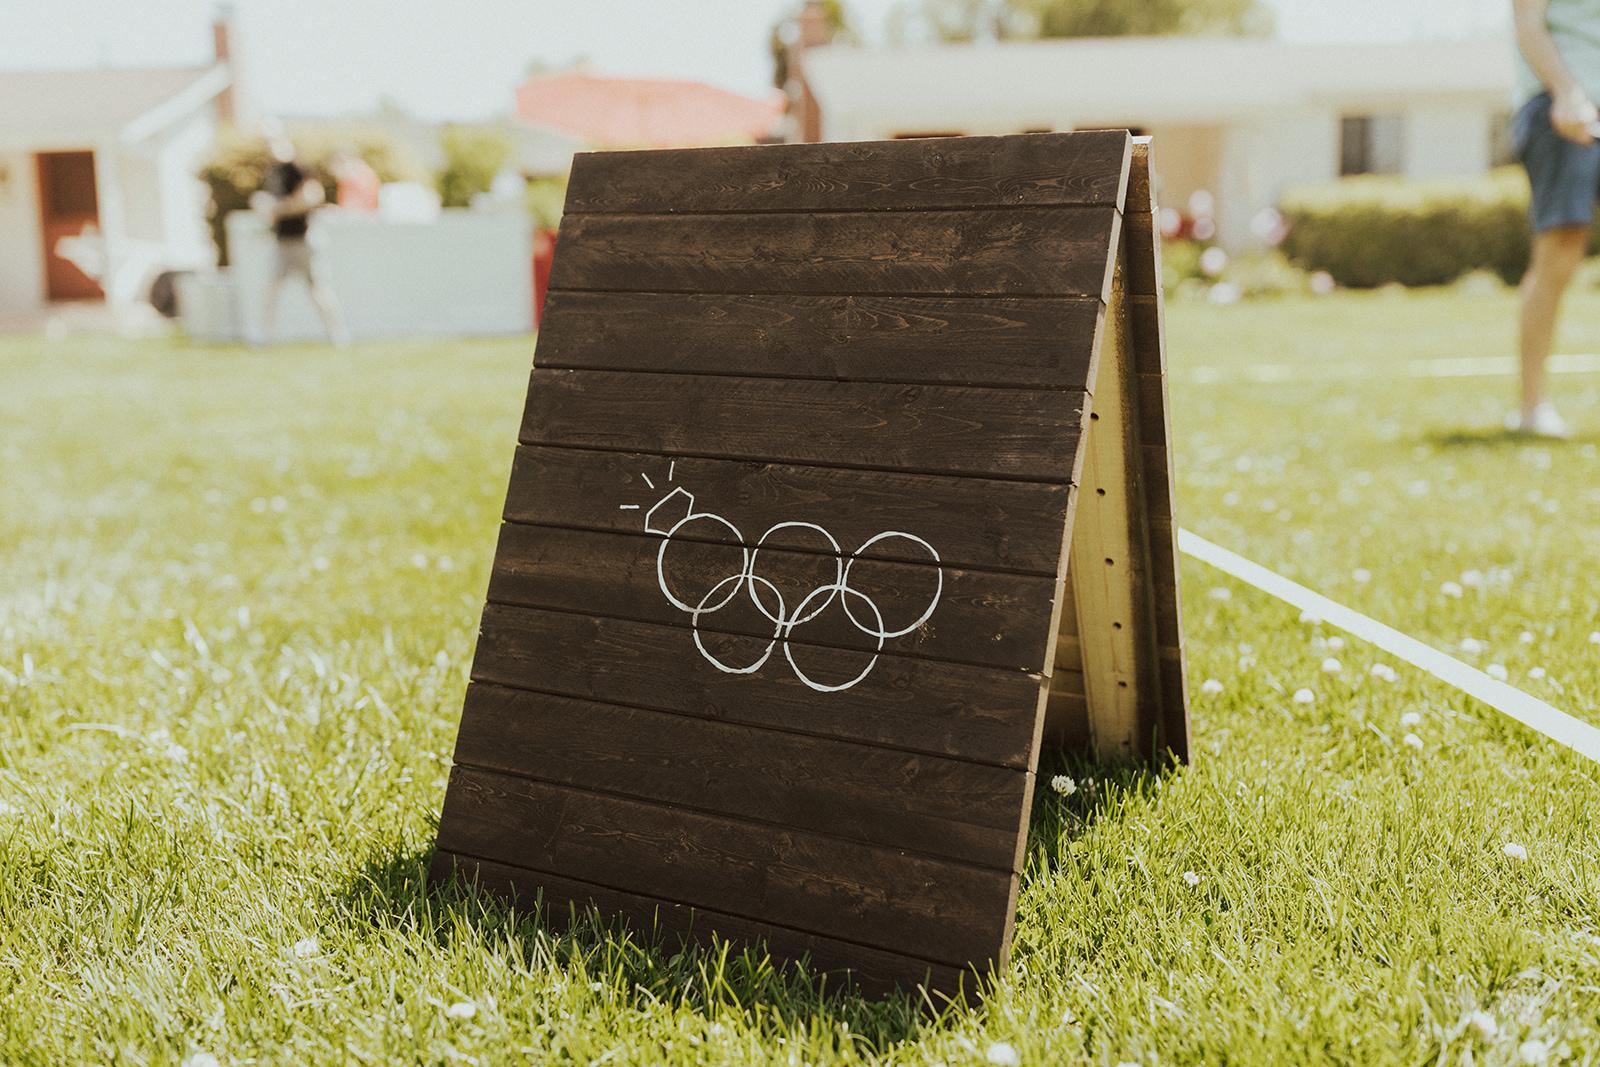 Olynnpics_Olivia_Will_Wedding_13 - Copy.jpg